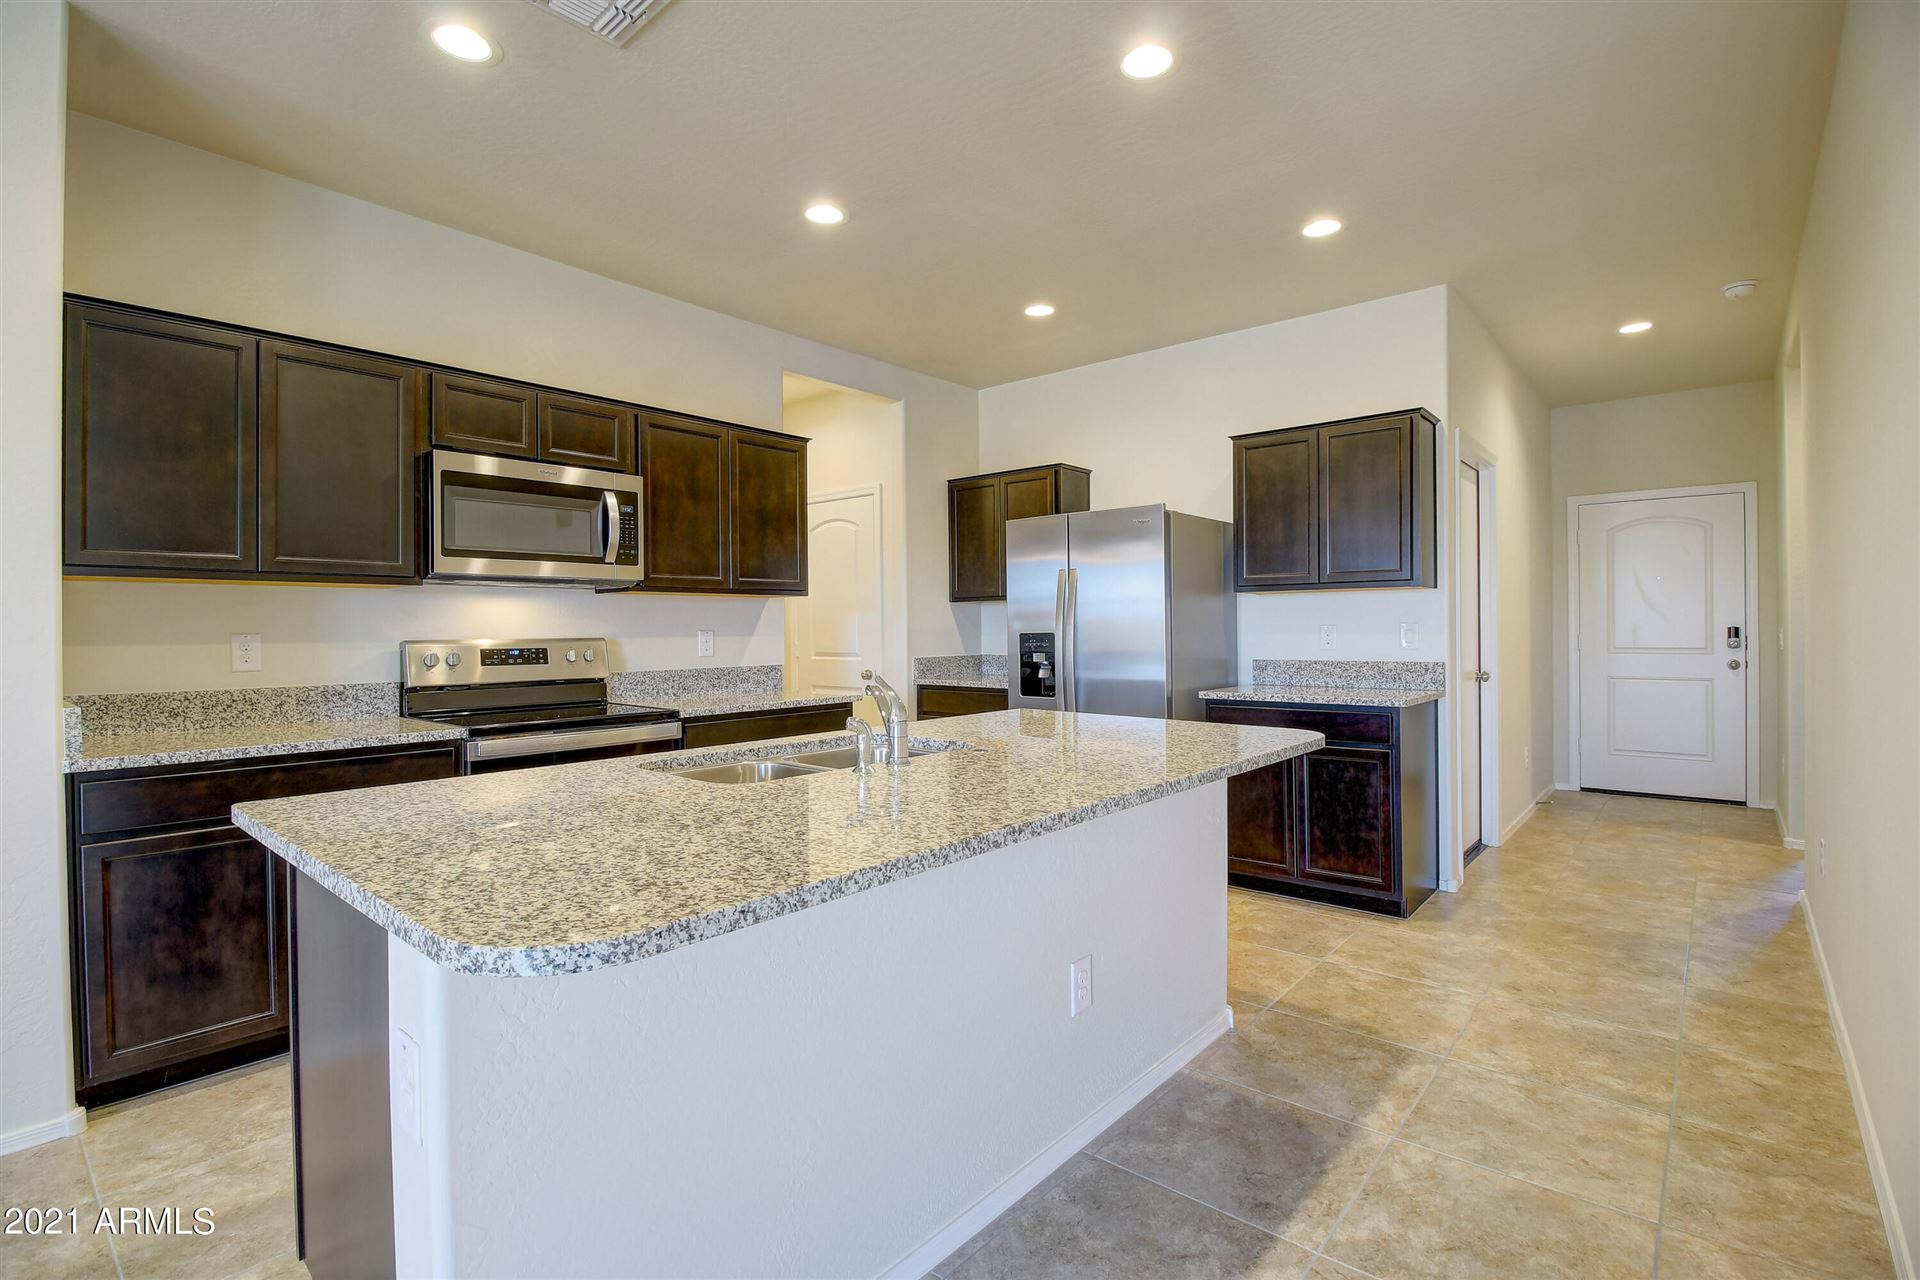 Photo of 28356 N CHALCOCITE Street, San Tan Valley, AZ 85143 (MLS # 6296199)